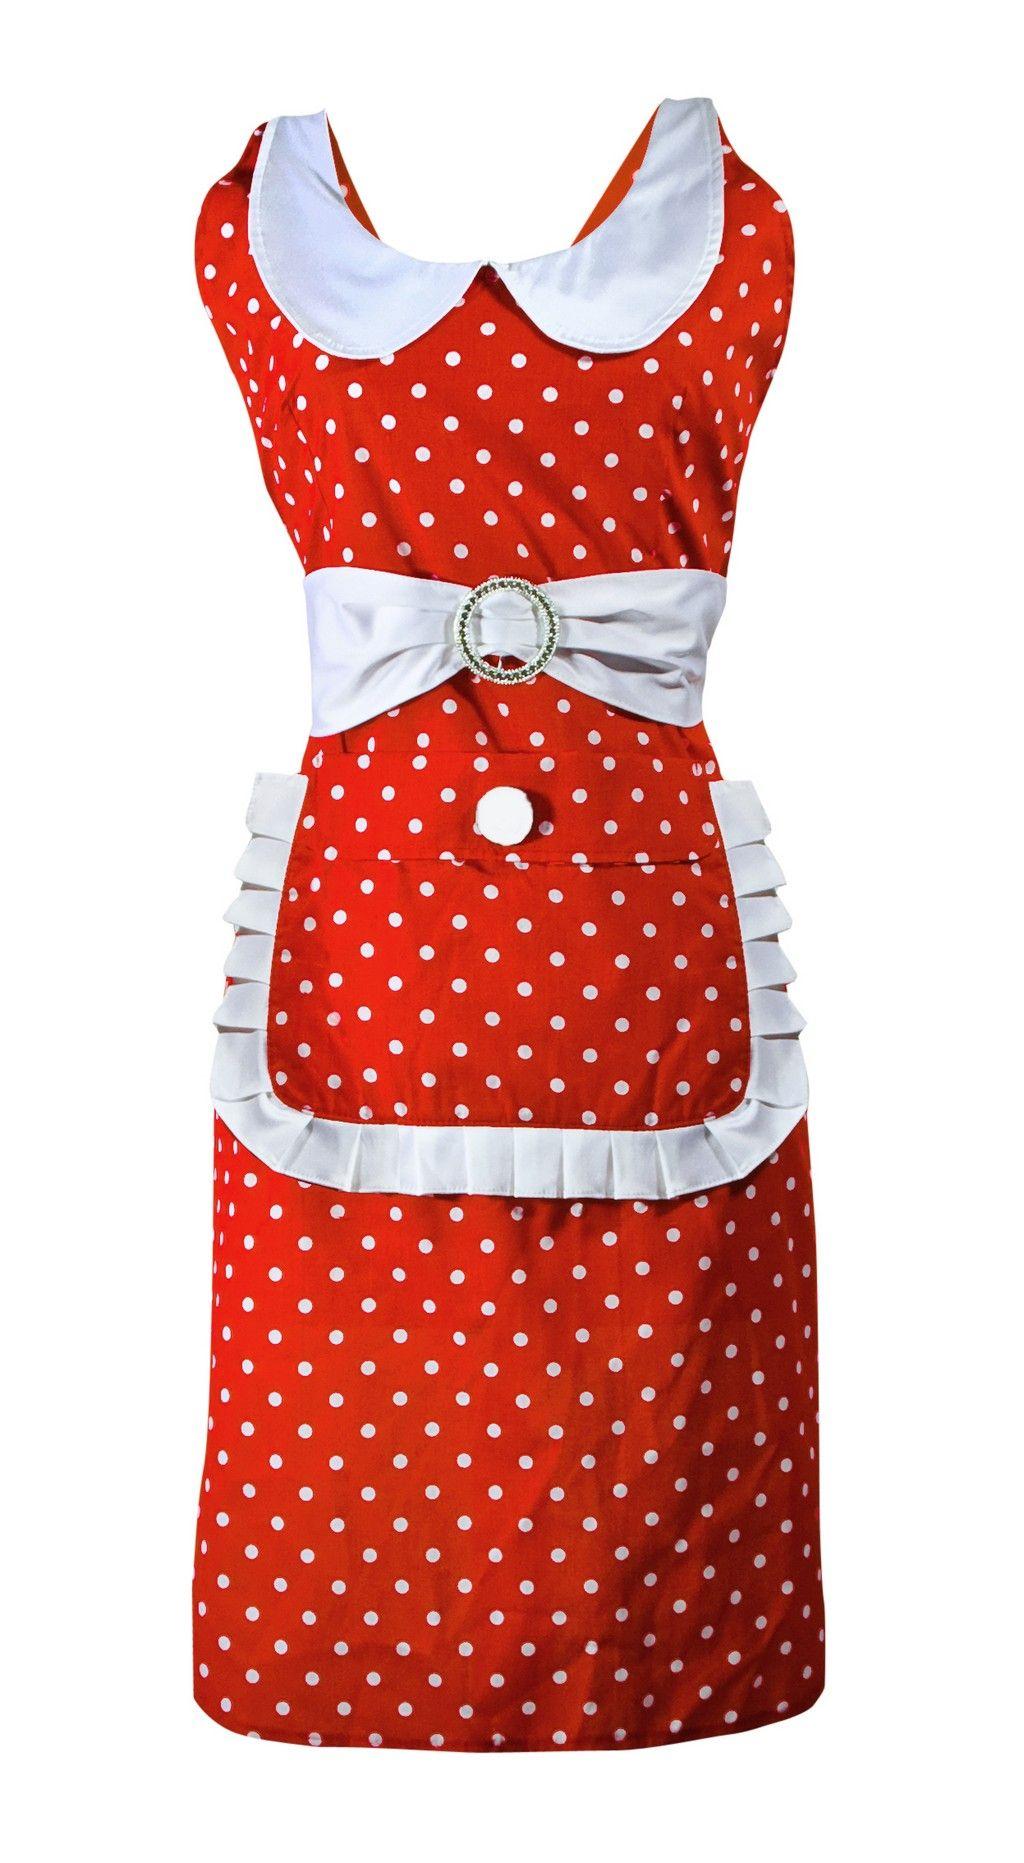 Apron Patterns Free Online | free apron pattern, masonic aprons, 50s ...